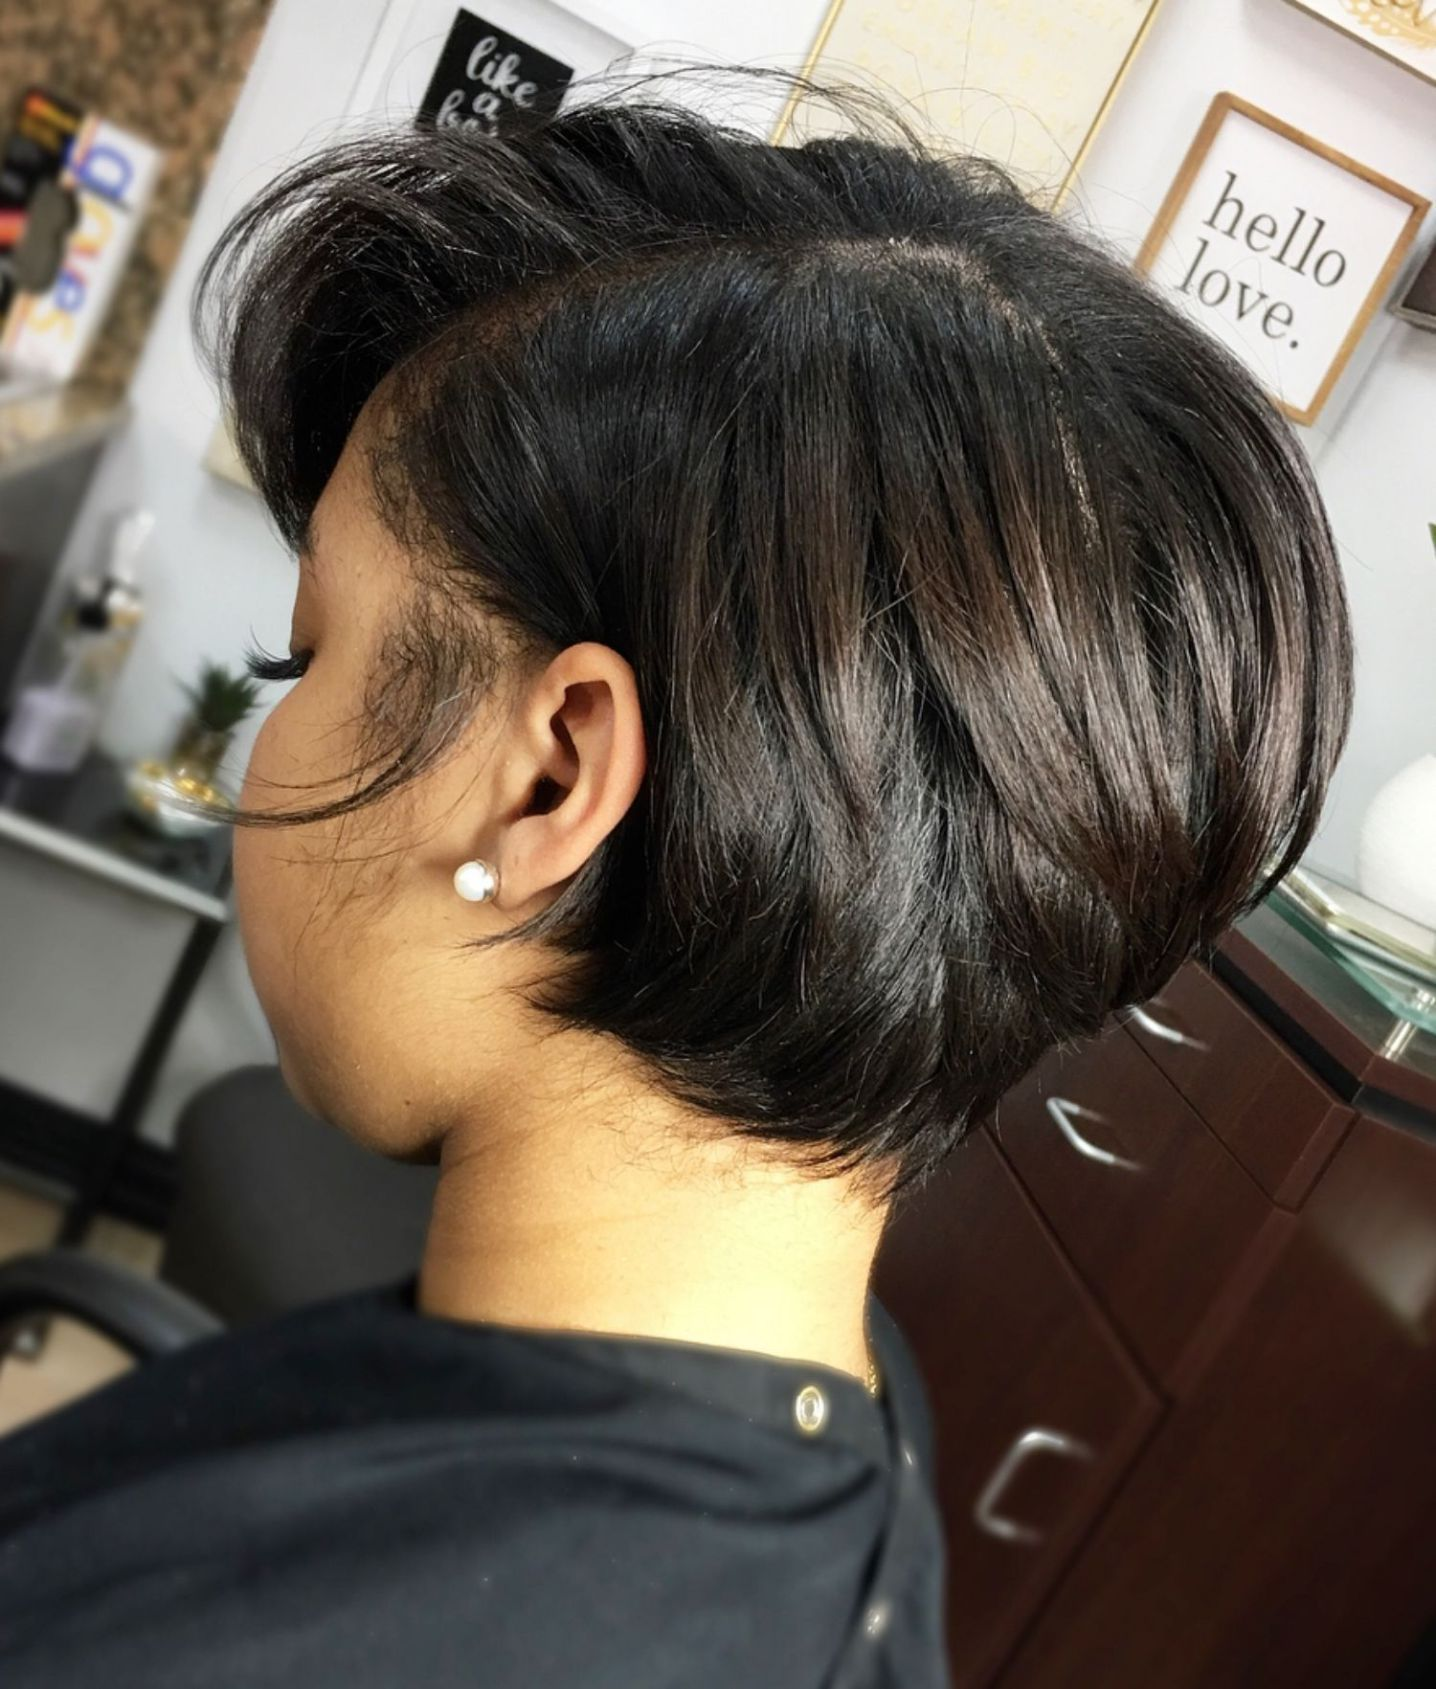 Short Black Bob Hairstyle Blackhairstyles Short Hair Styles Hair Styles Short Bob Hairstyles